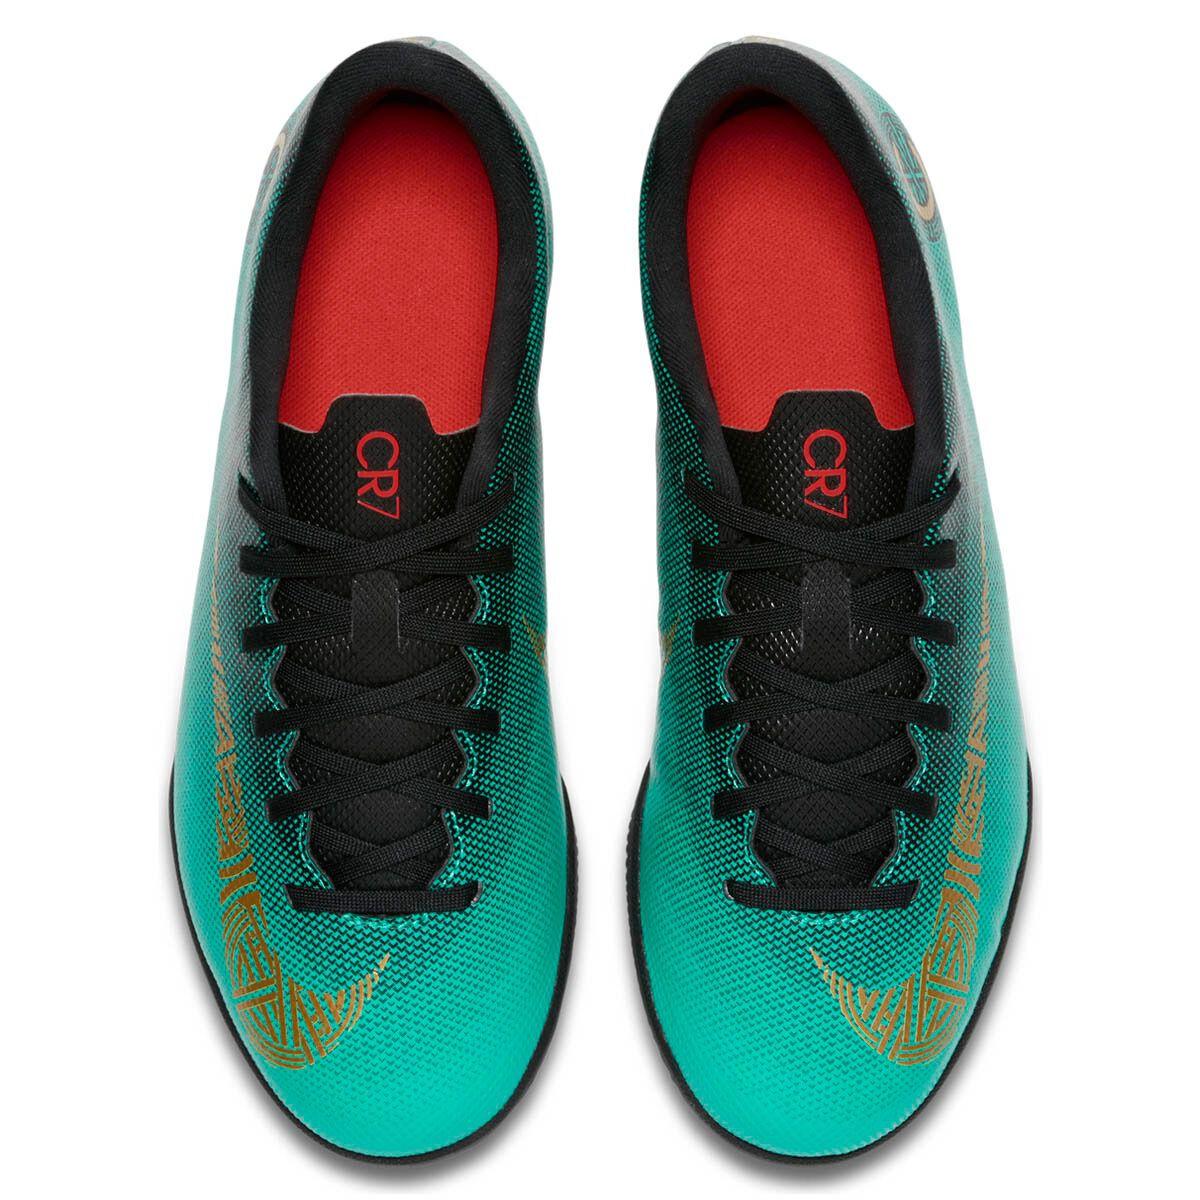 Buy 2015 Top Quality Cristiano Ronaldo Cr7 Soccer Shoes .